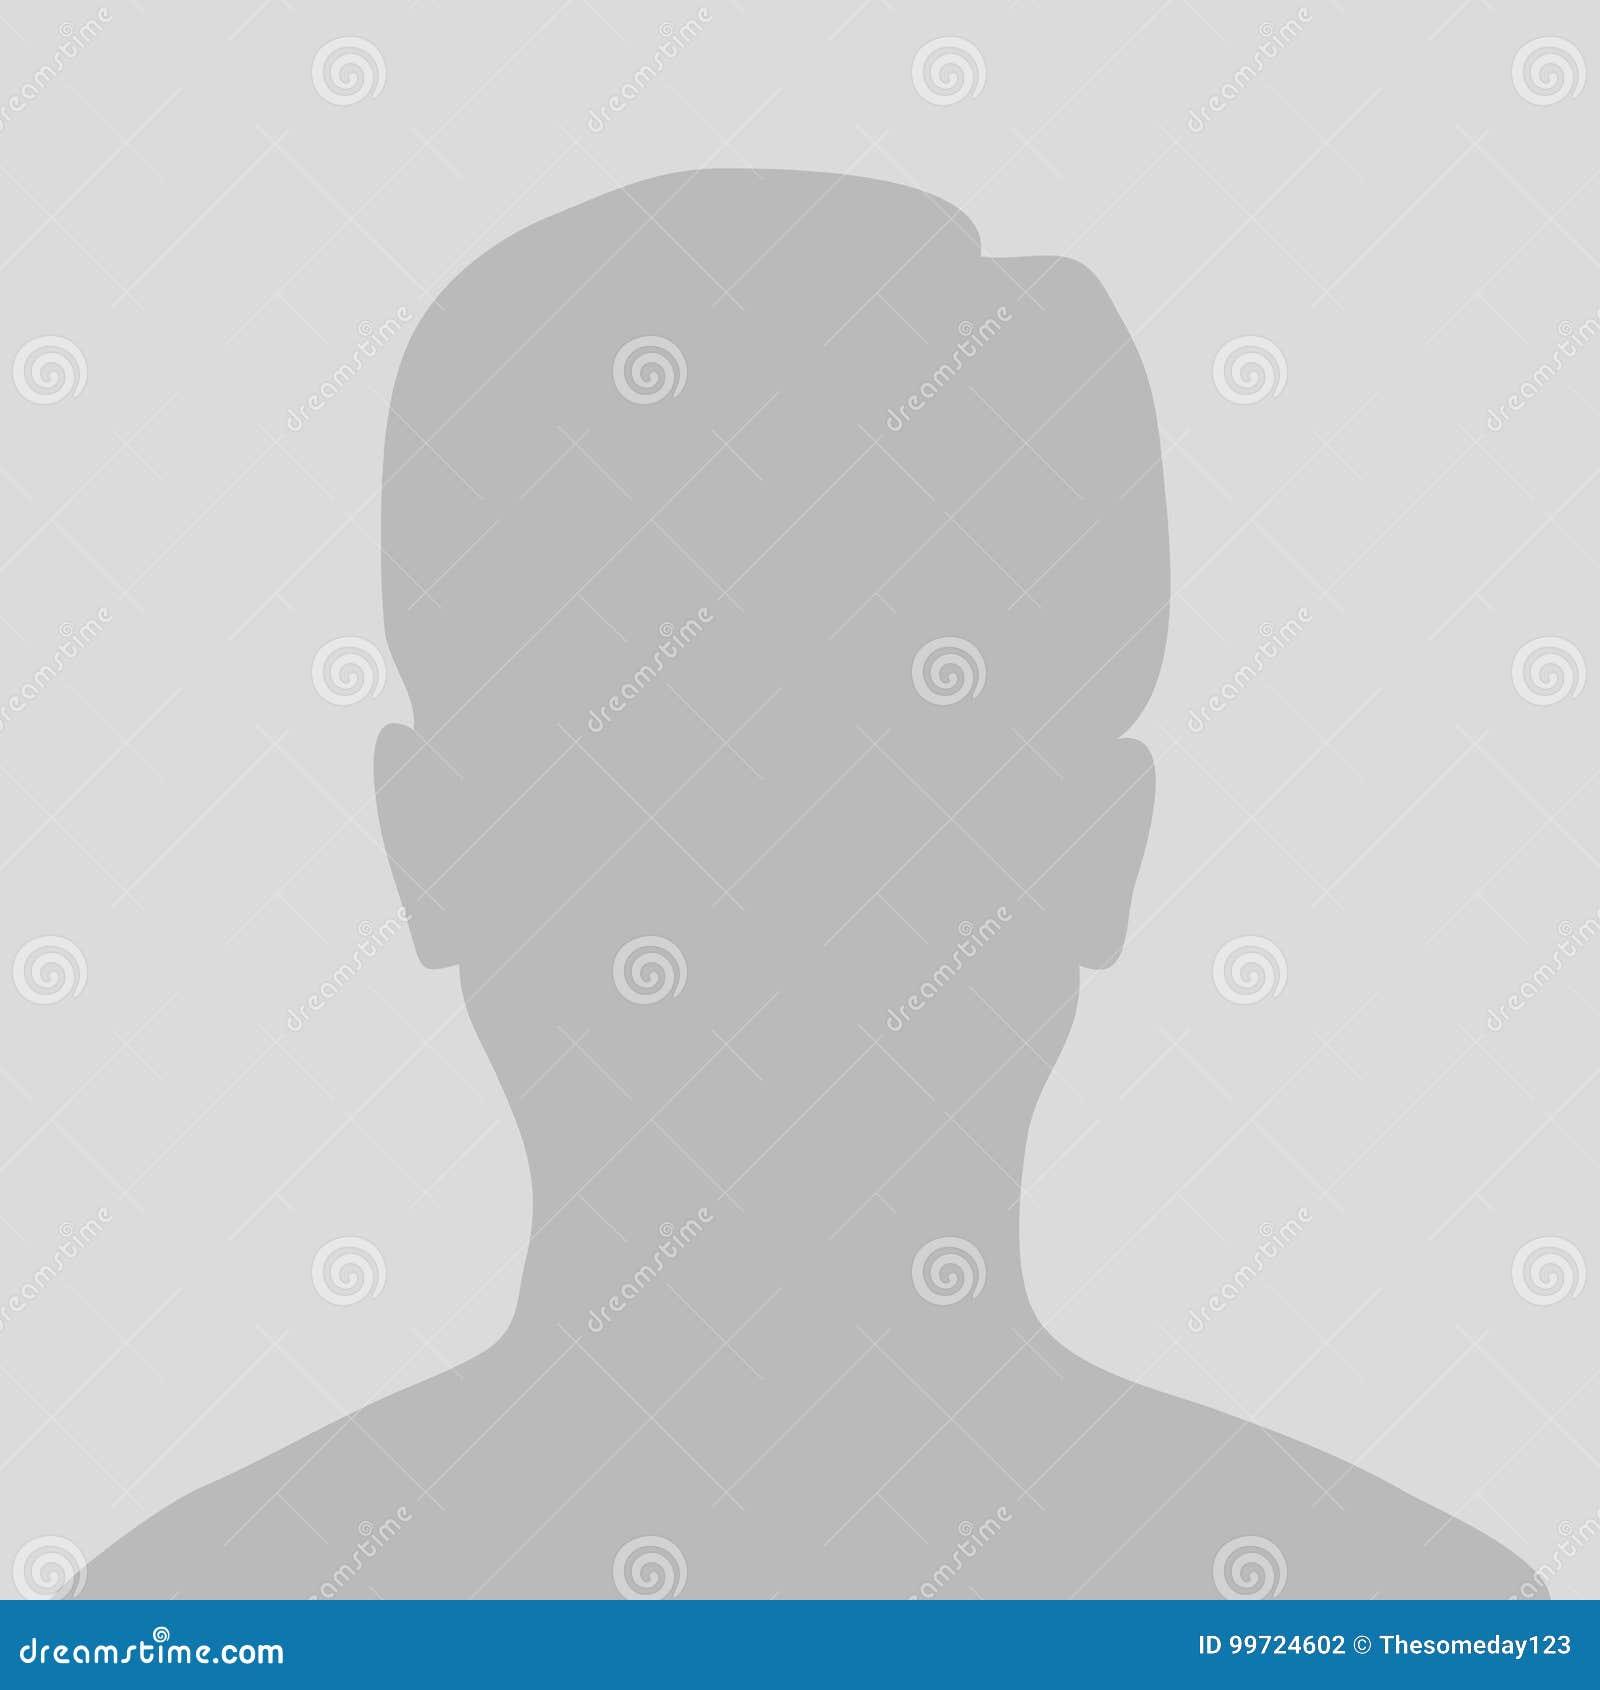 Default Avatar Profile Icon, Grey Photo Placeholder Stock